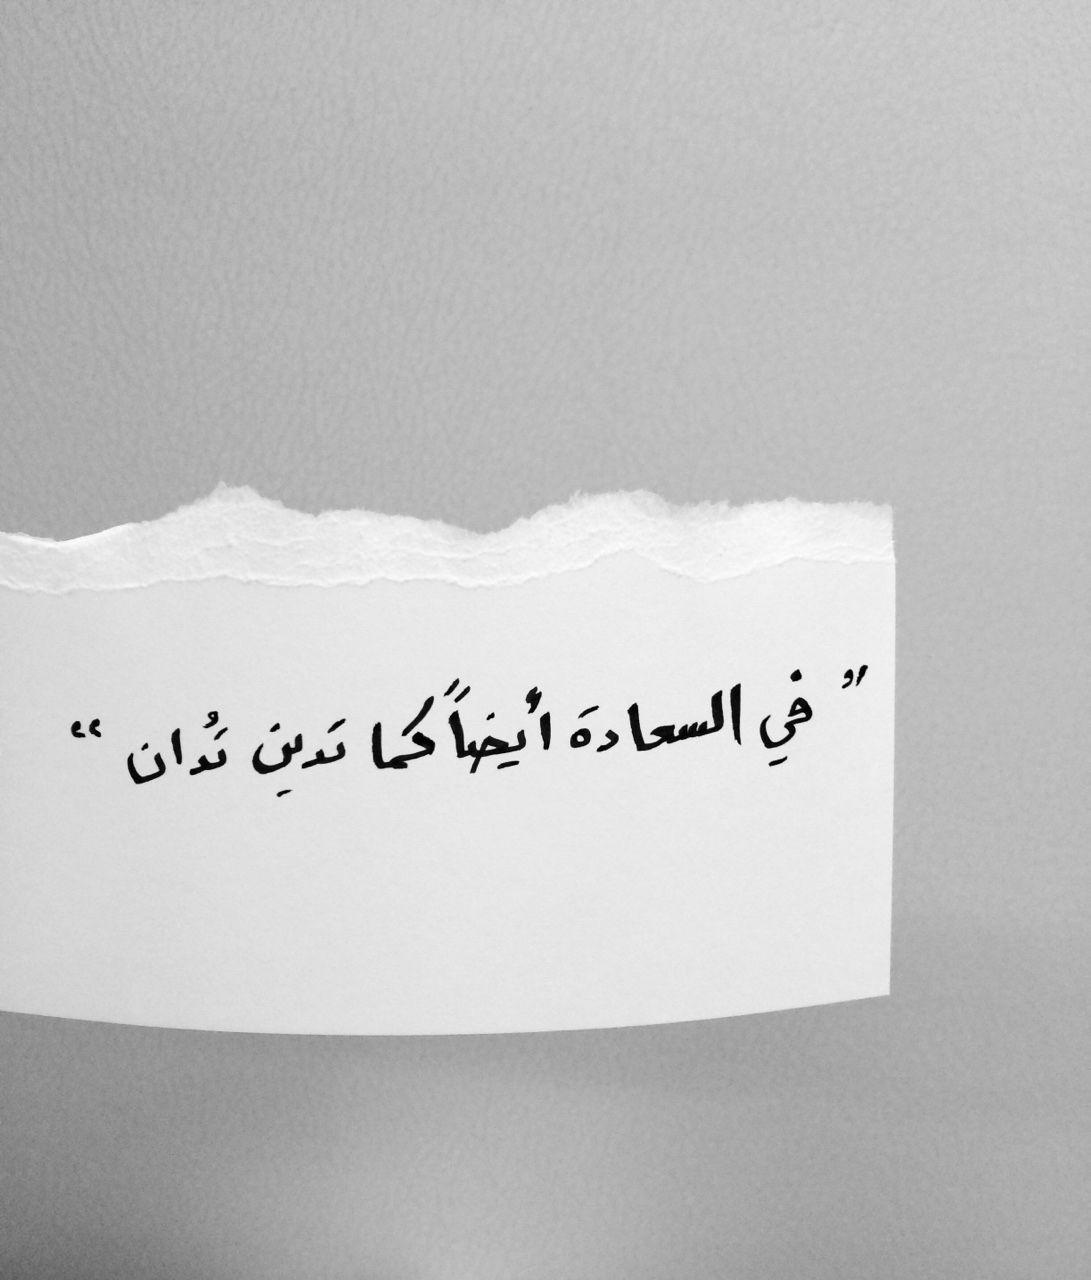 في السعادة أيضا كما تدين تدان Words Quotes Islamic Inspirational Quotes Some Quotes